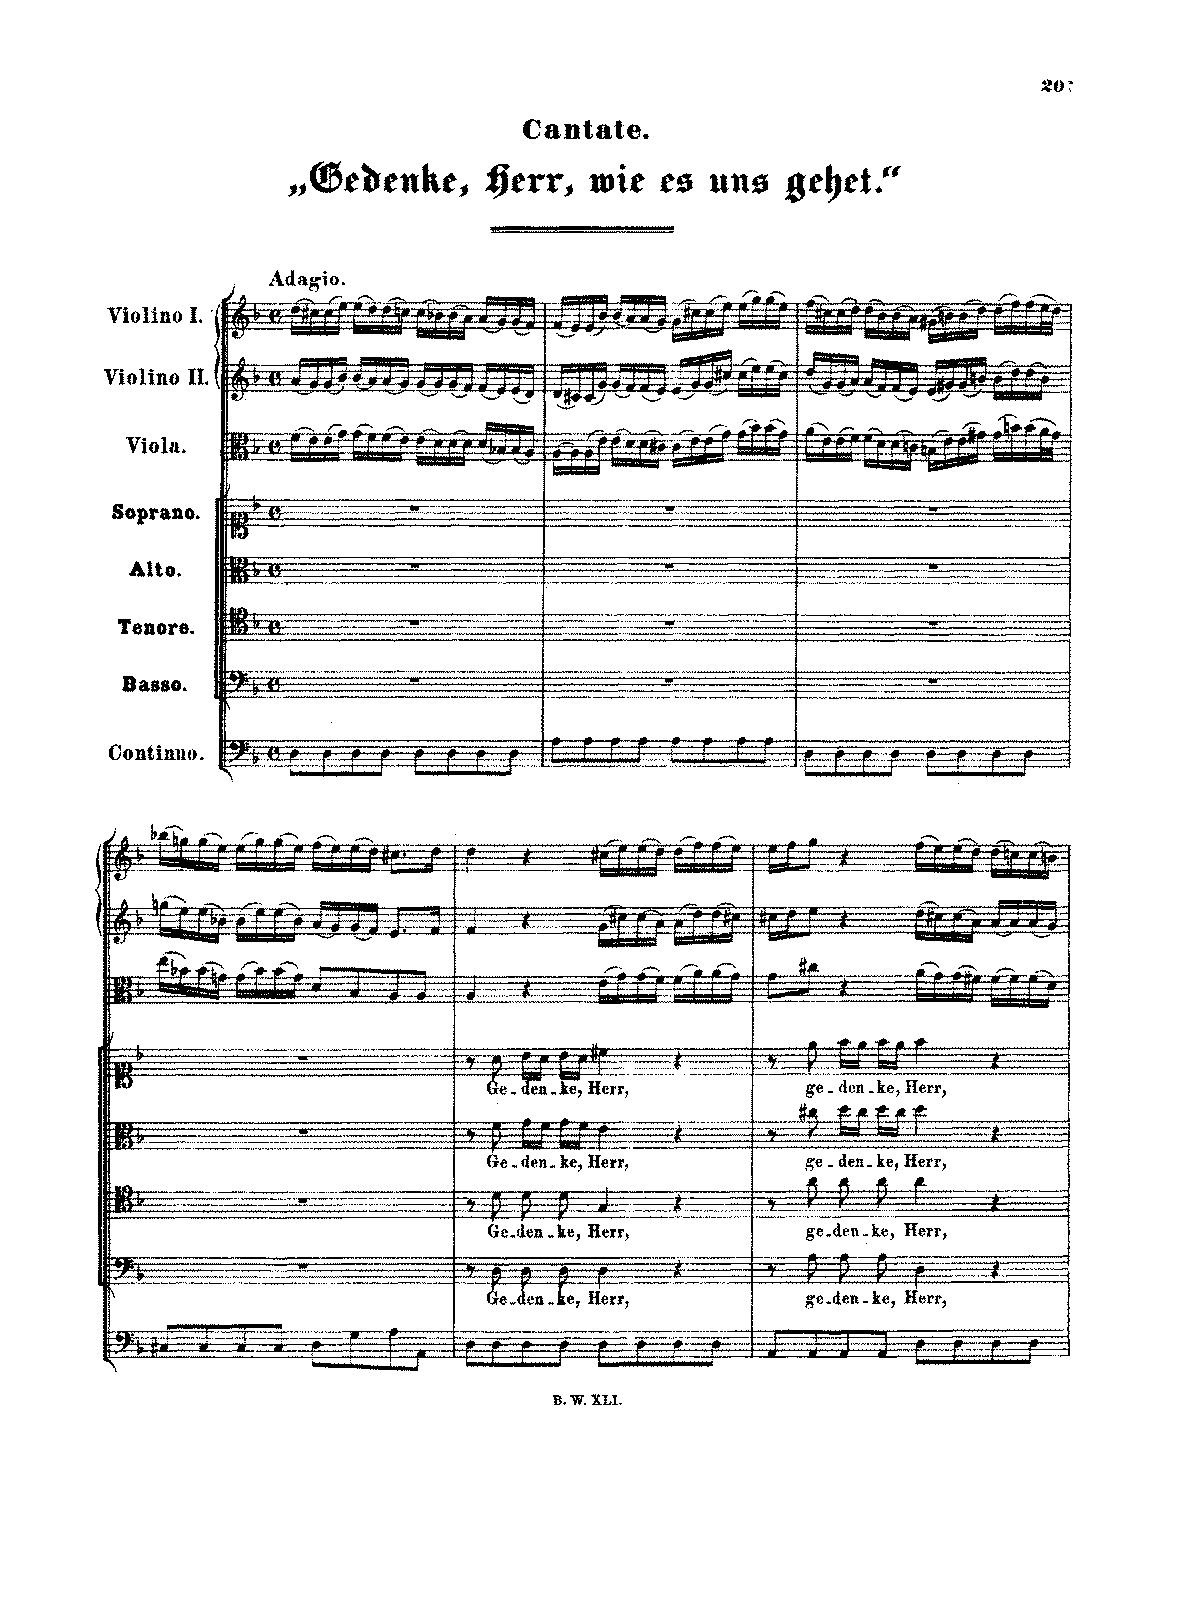 Gedenke, Herr, wie es uns gehet, BWV 217 (Bach, Johann Sebastian ...